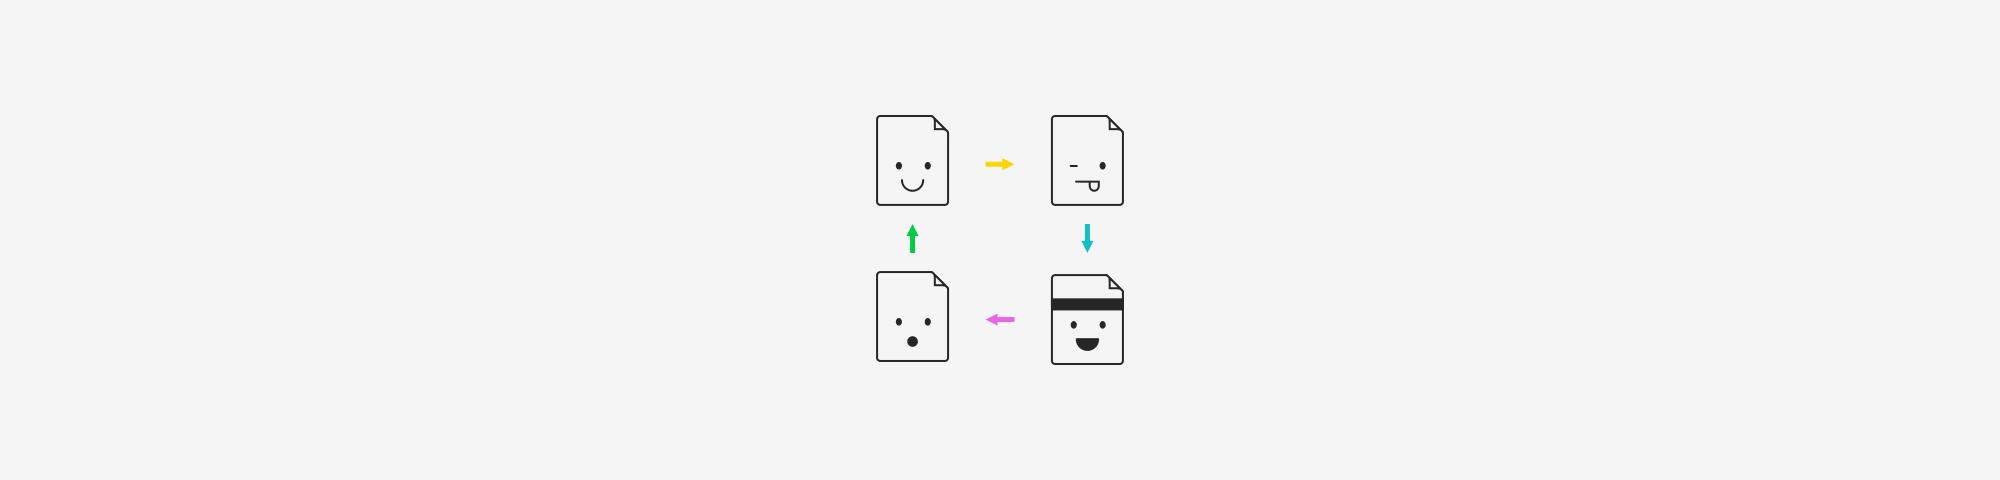 jpg-to-pdf